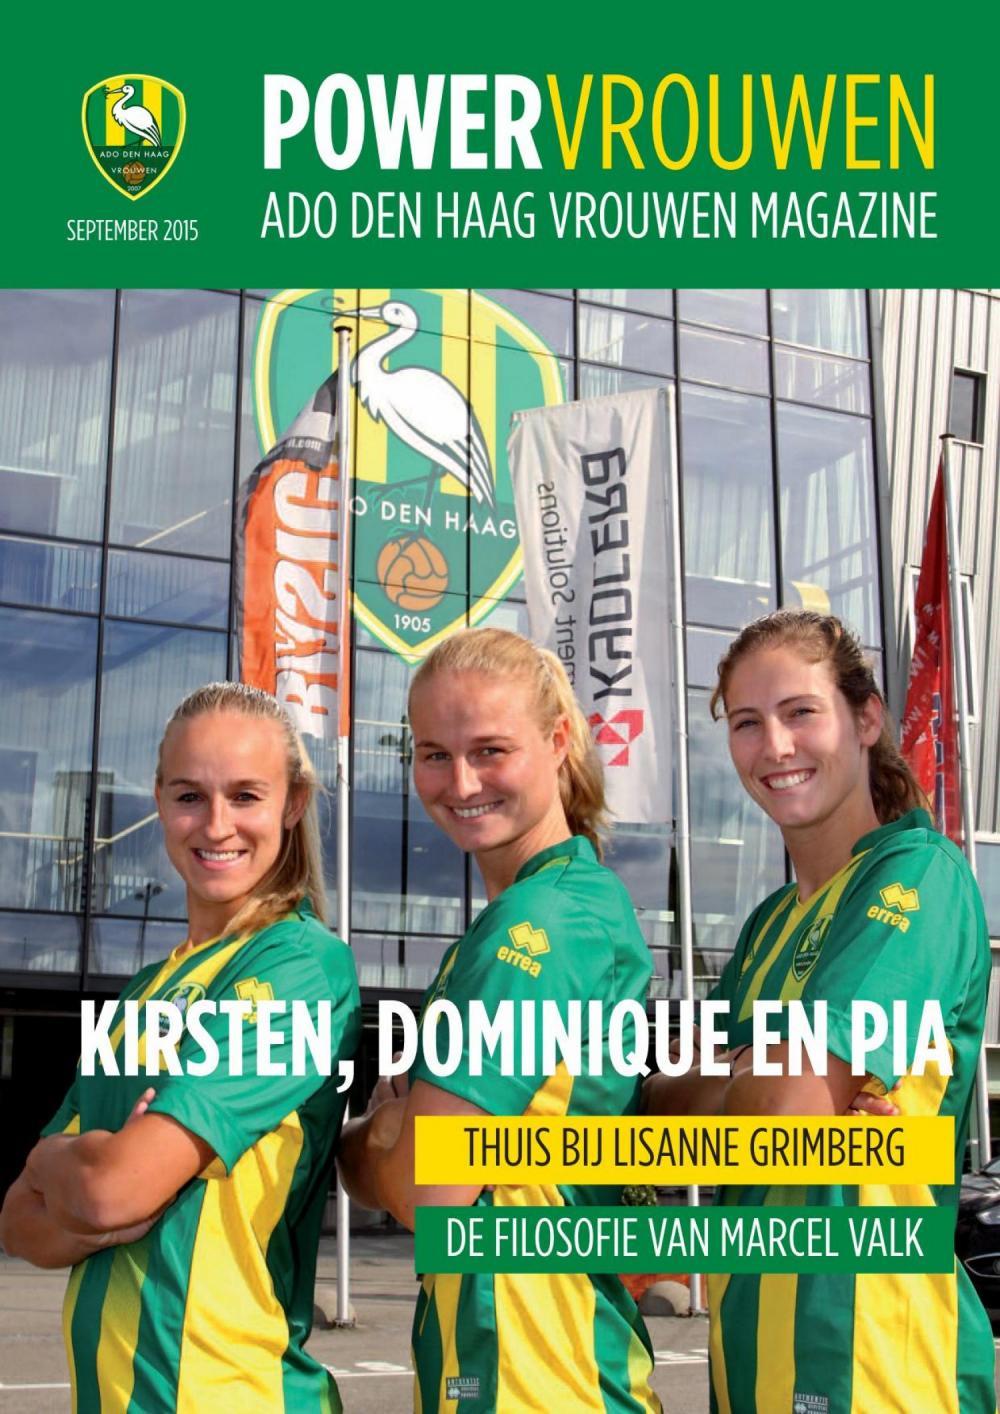 Powervrouwen Magazine september 2015